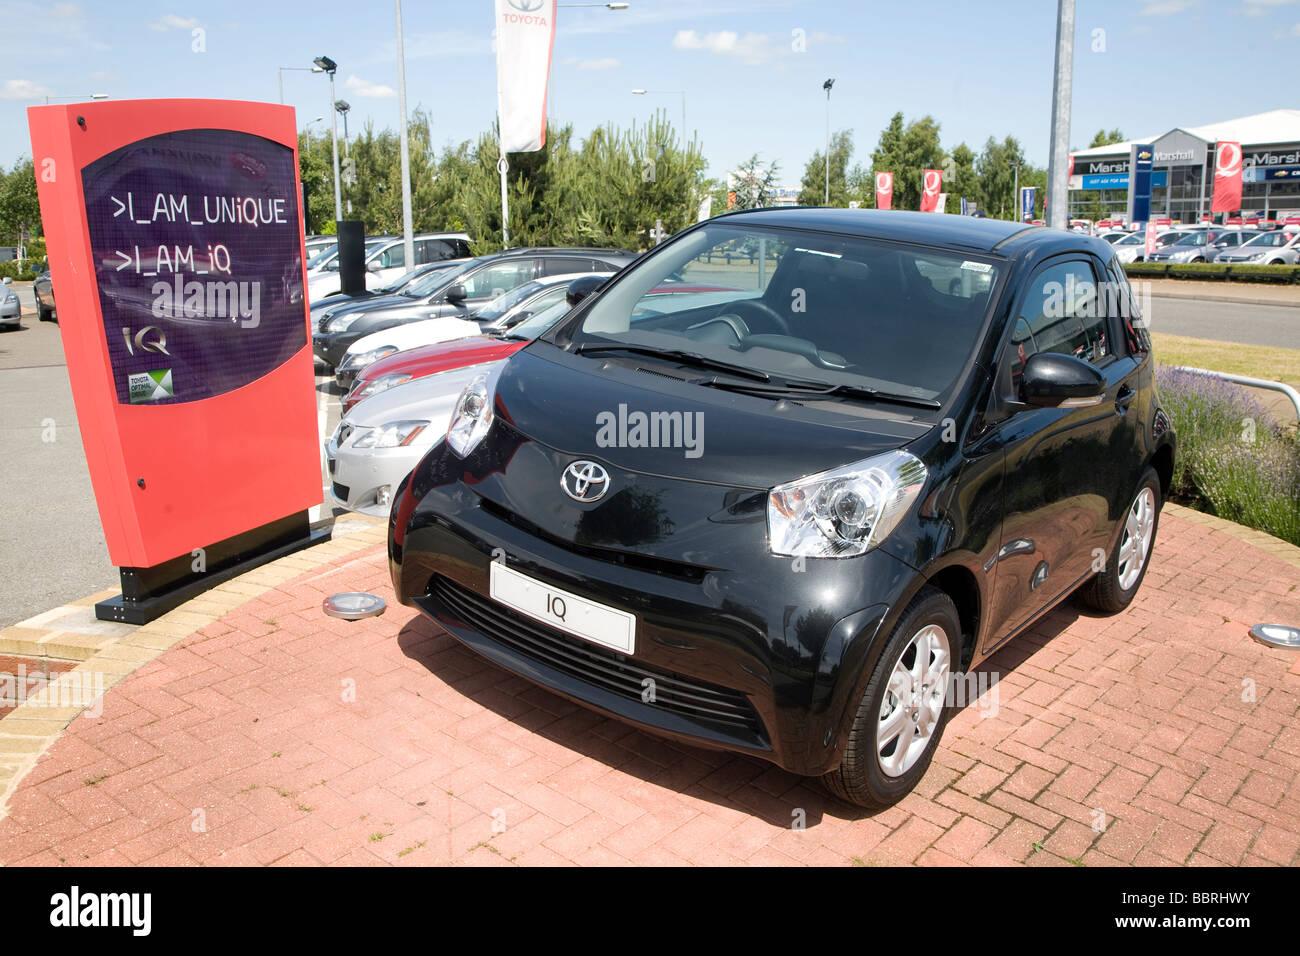 IQ car Car dealerships Ransomes Europark Ipswich Suffolk England - Stock Image